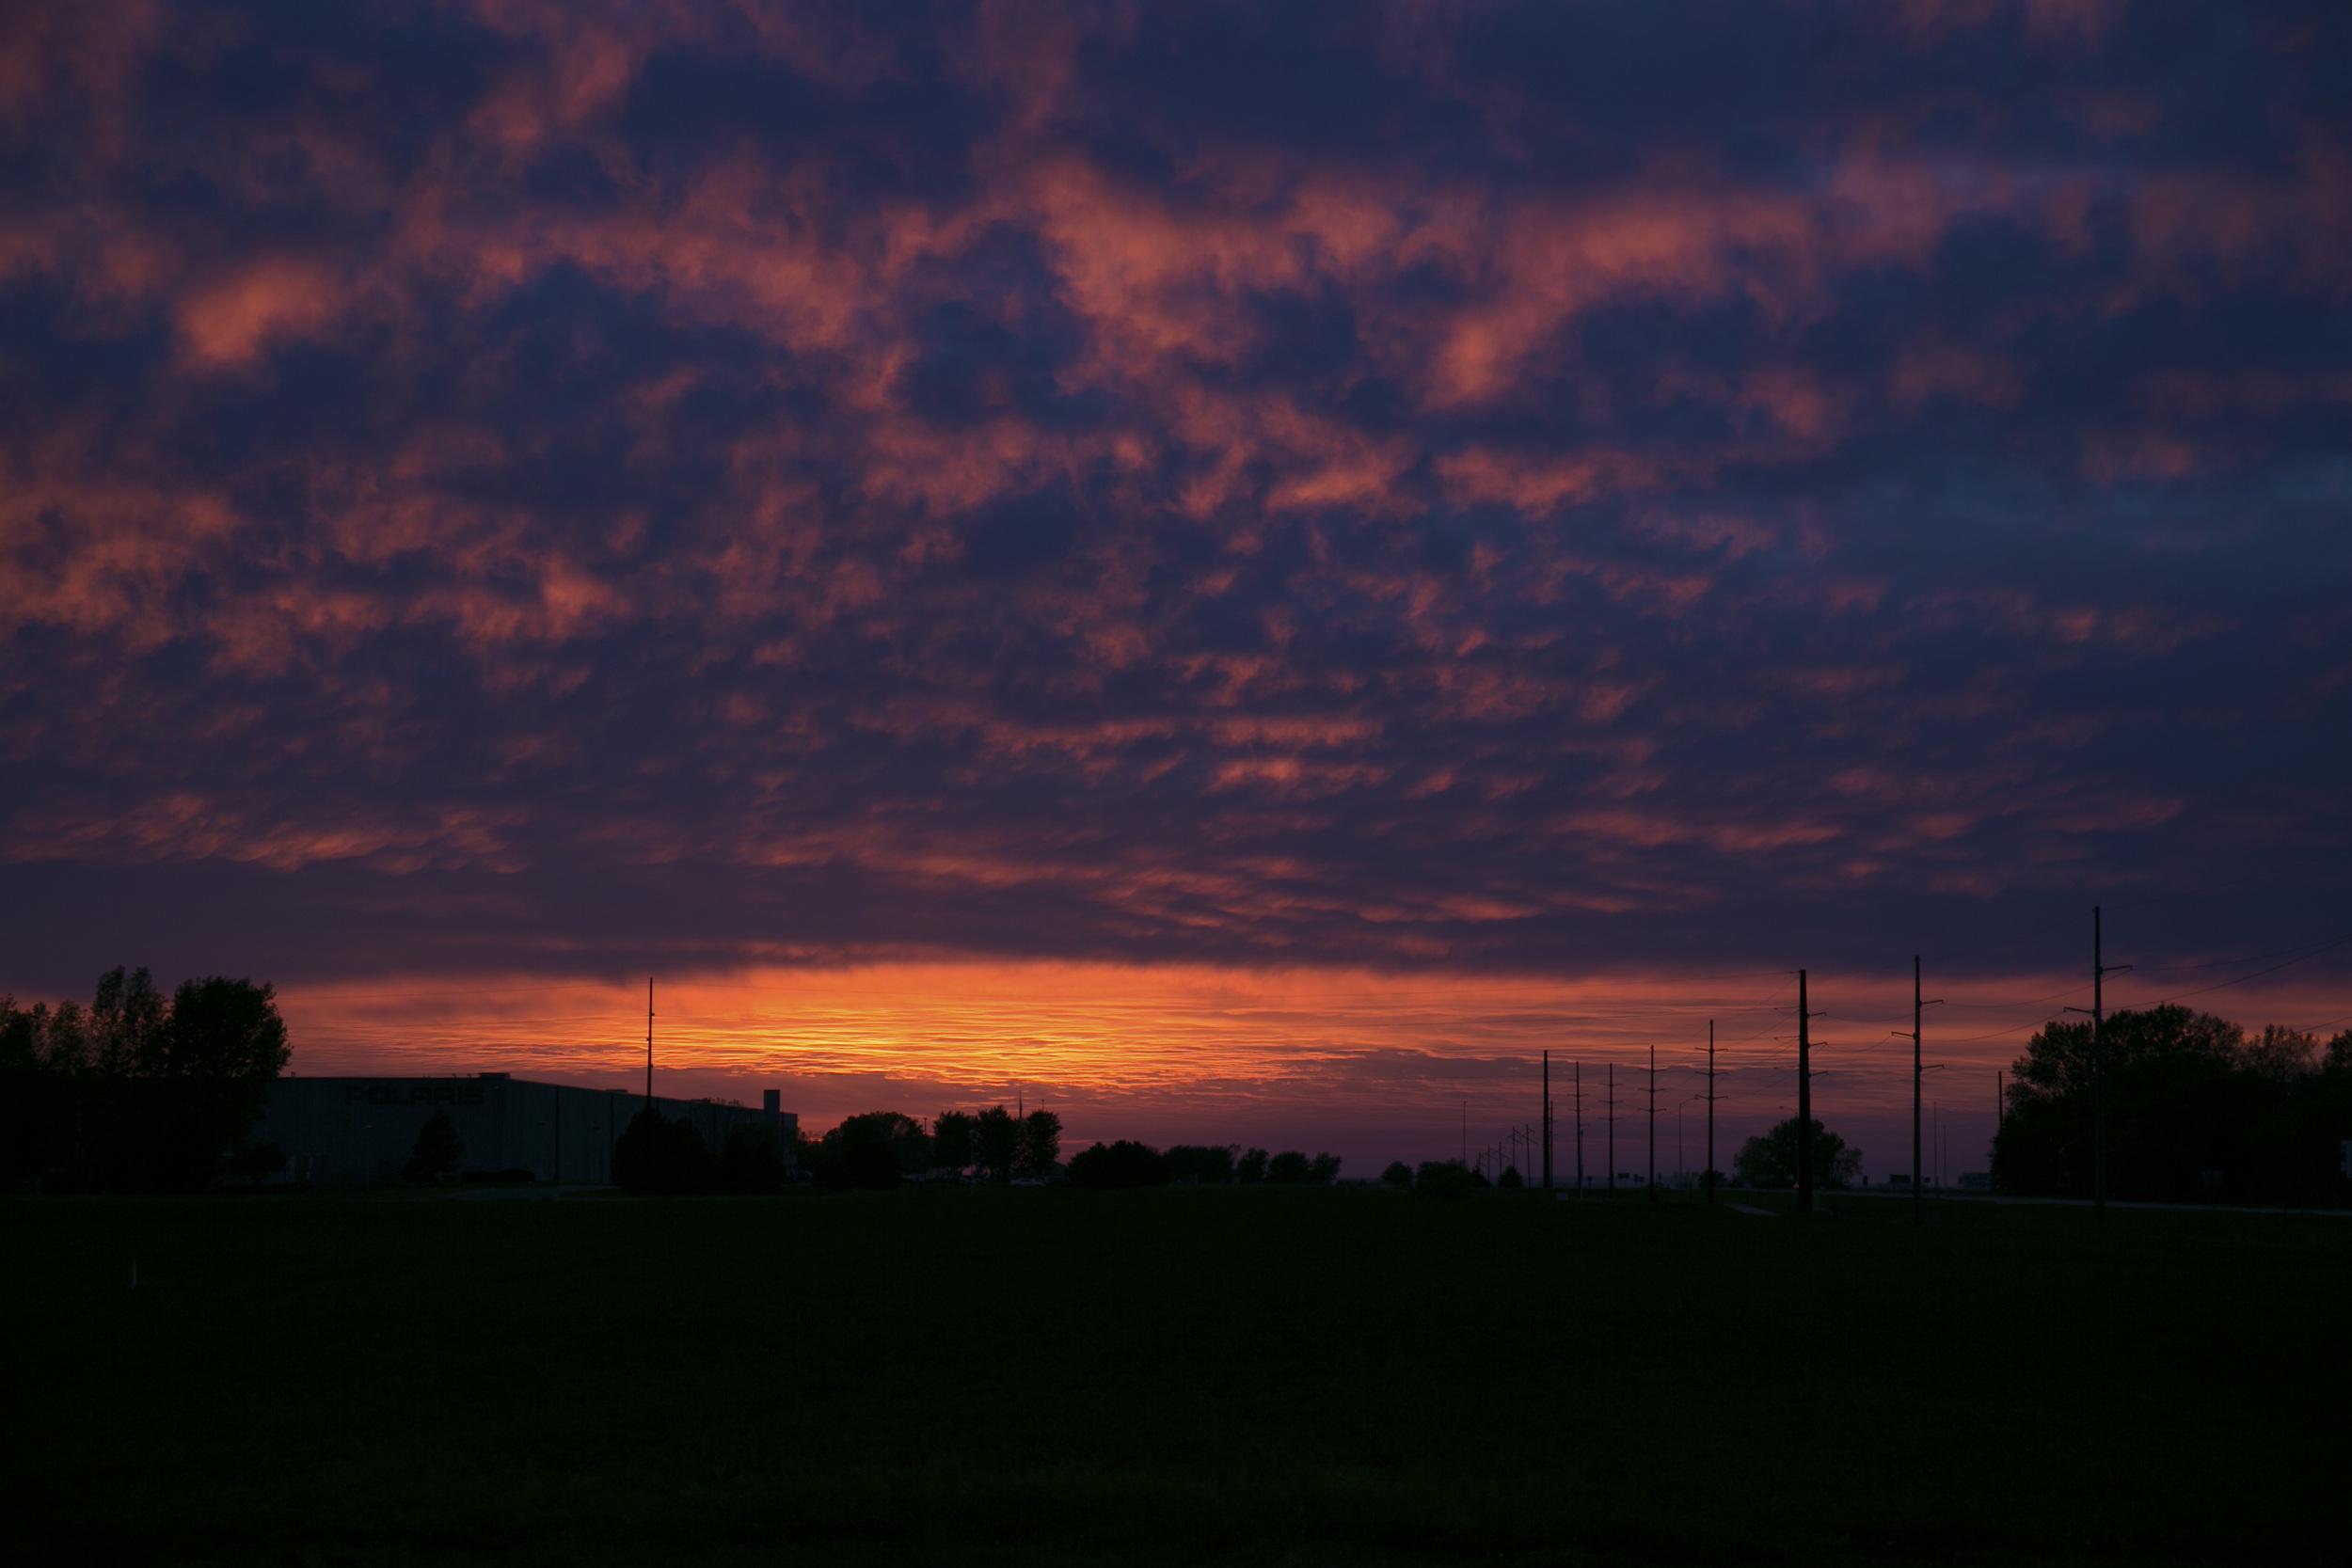 coral_sunset_01.jpg